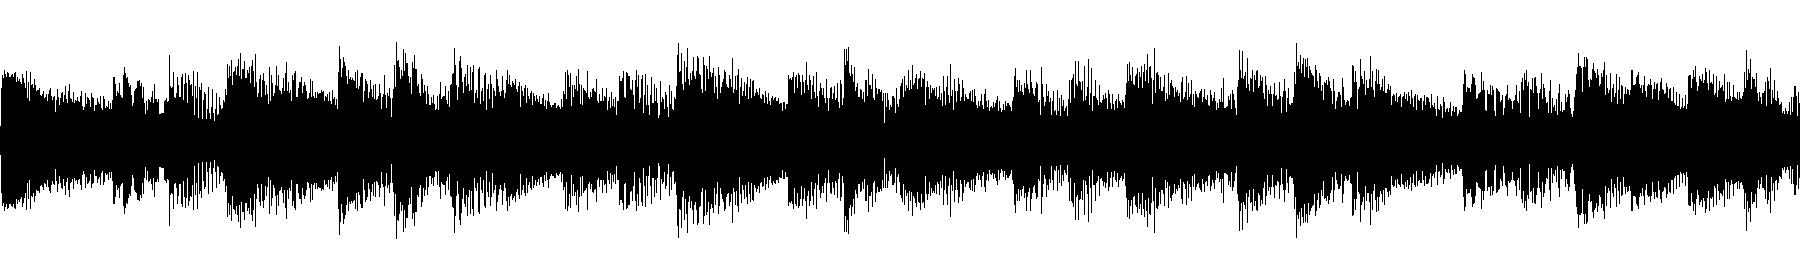 cymatics   2020 nostalgic melody loop 8   160 bpm g min